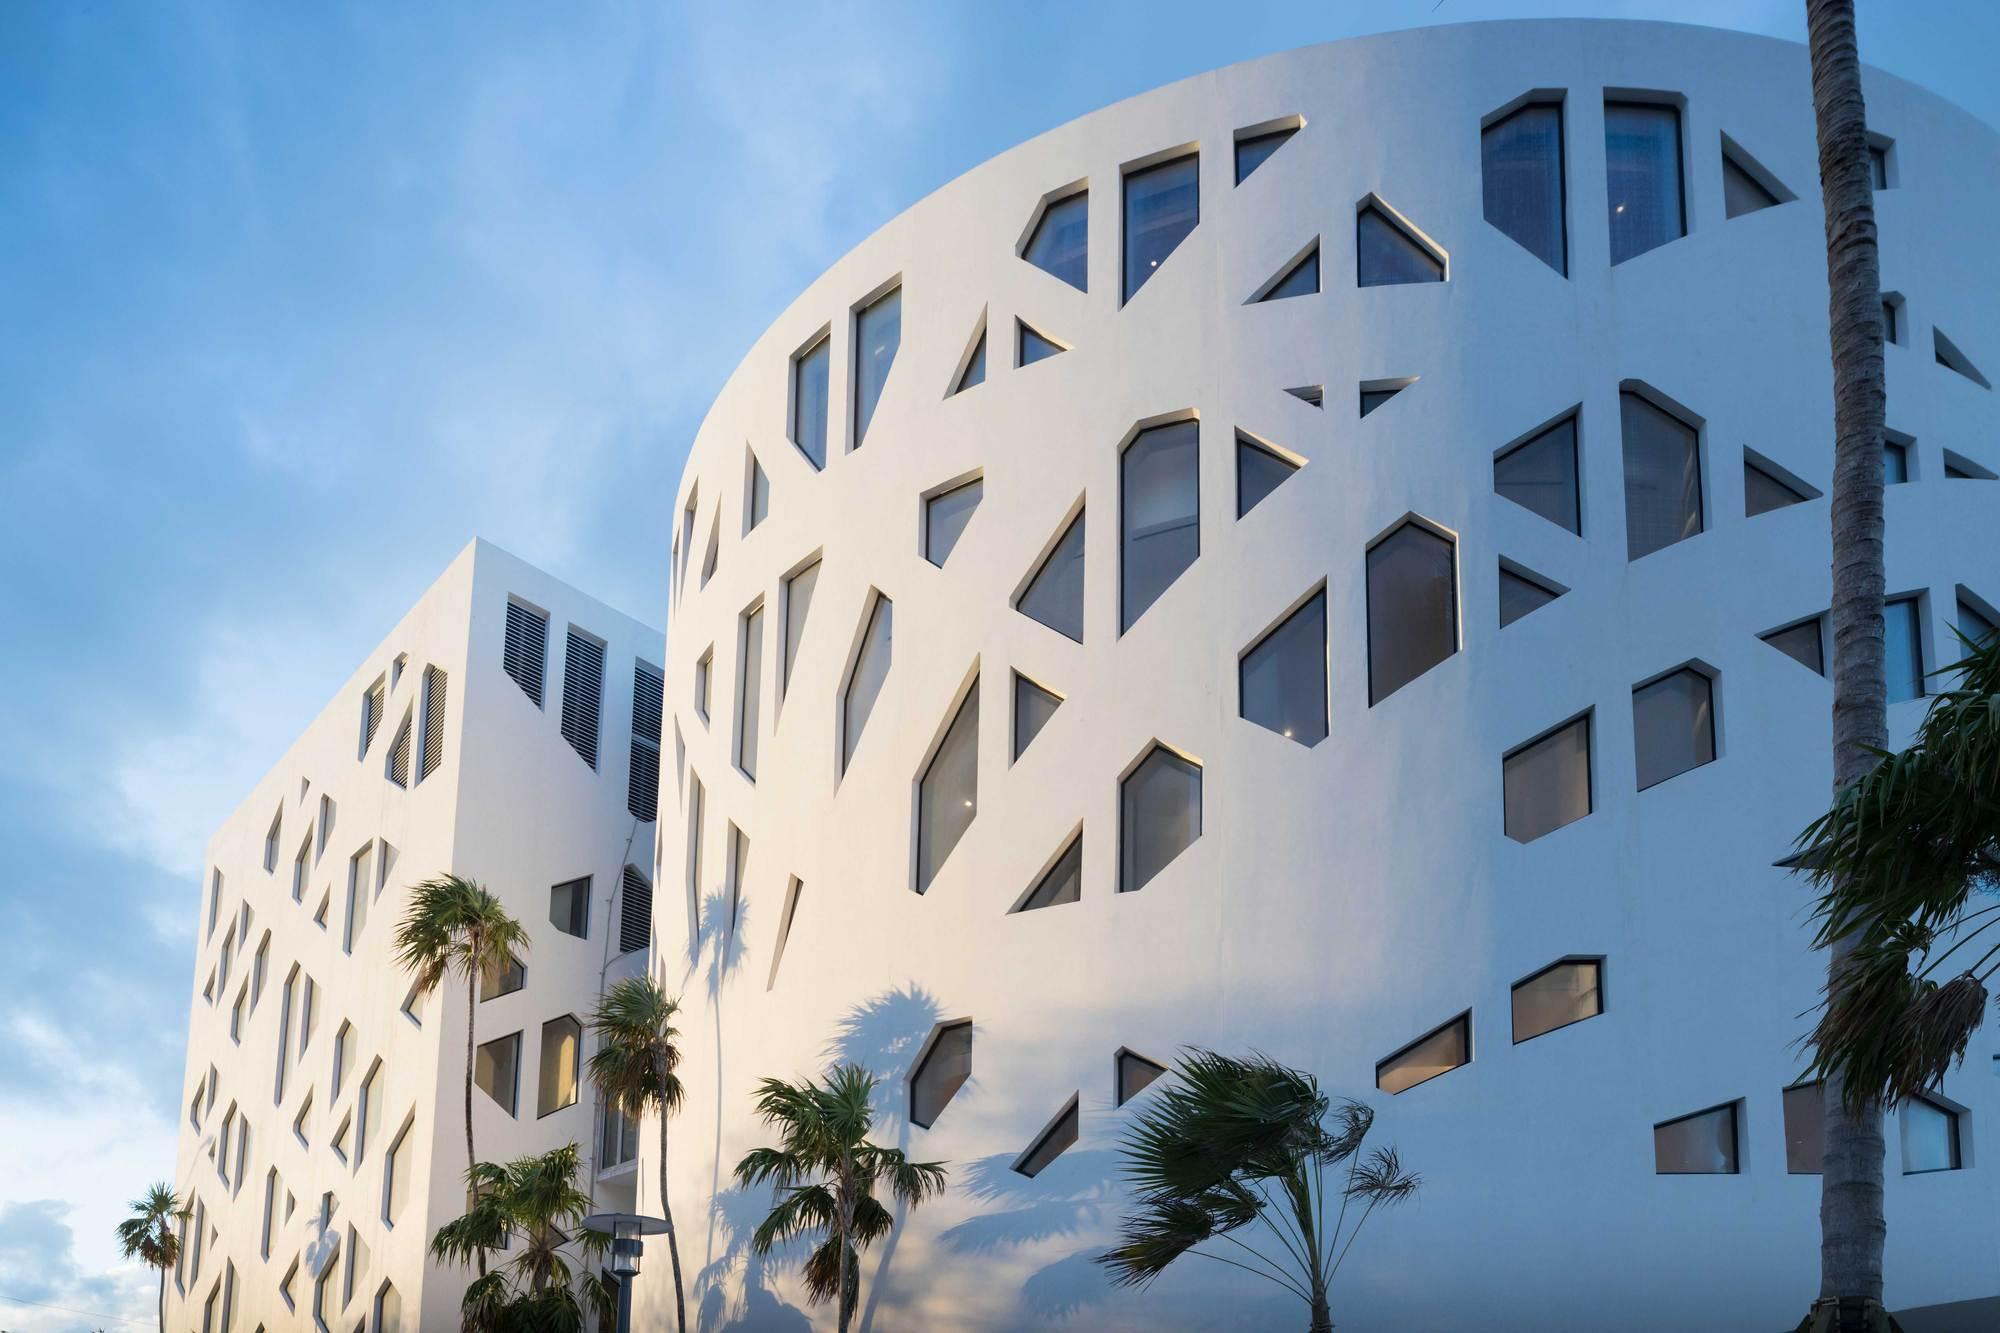 Gallery of faena forum faena bazaar and park oma 2 - Modern architectural trio ...